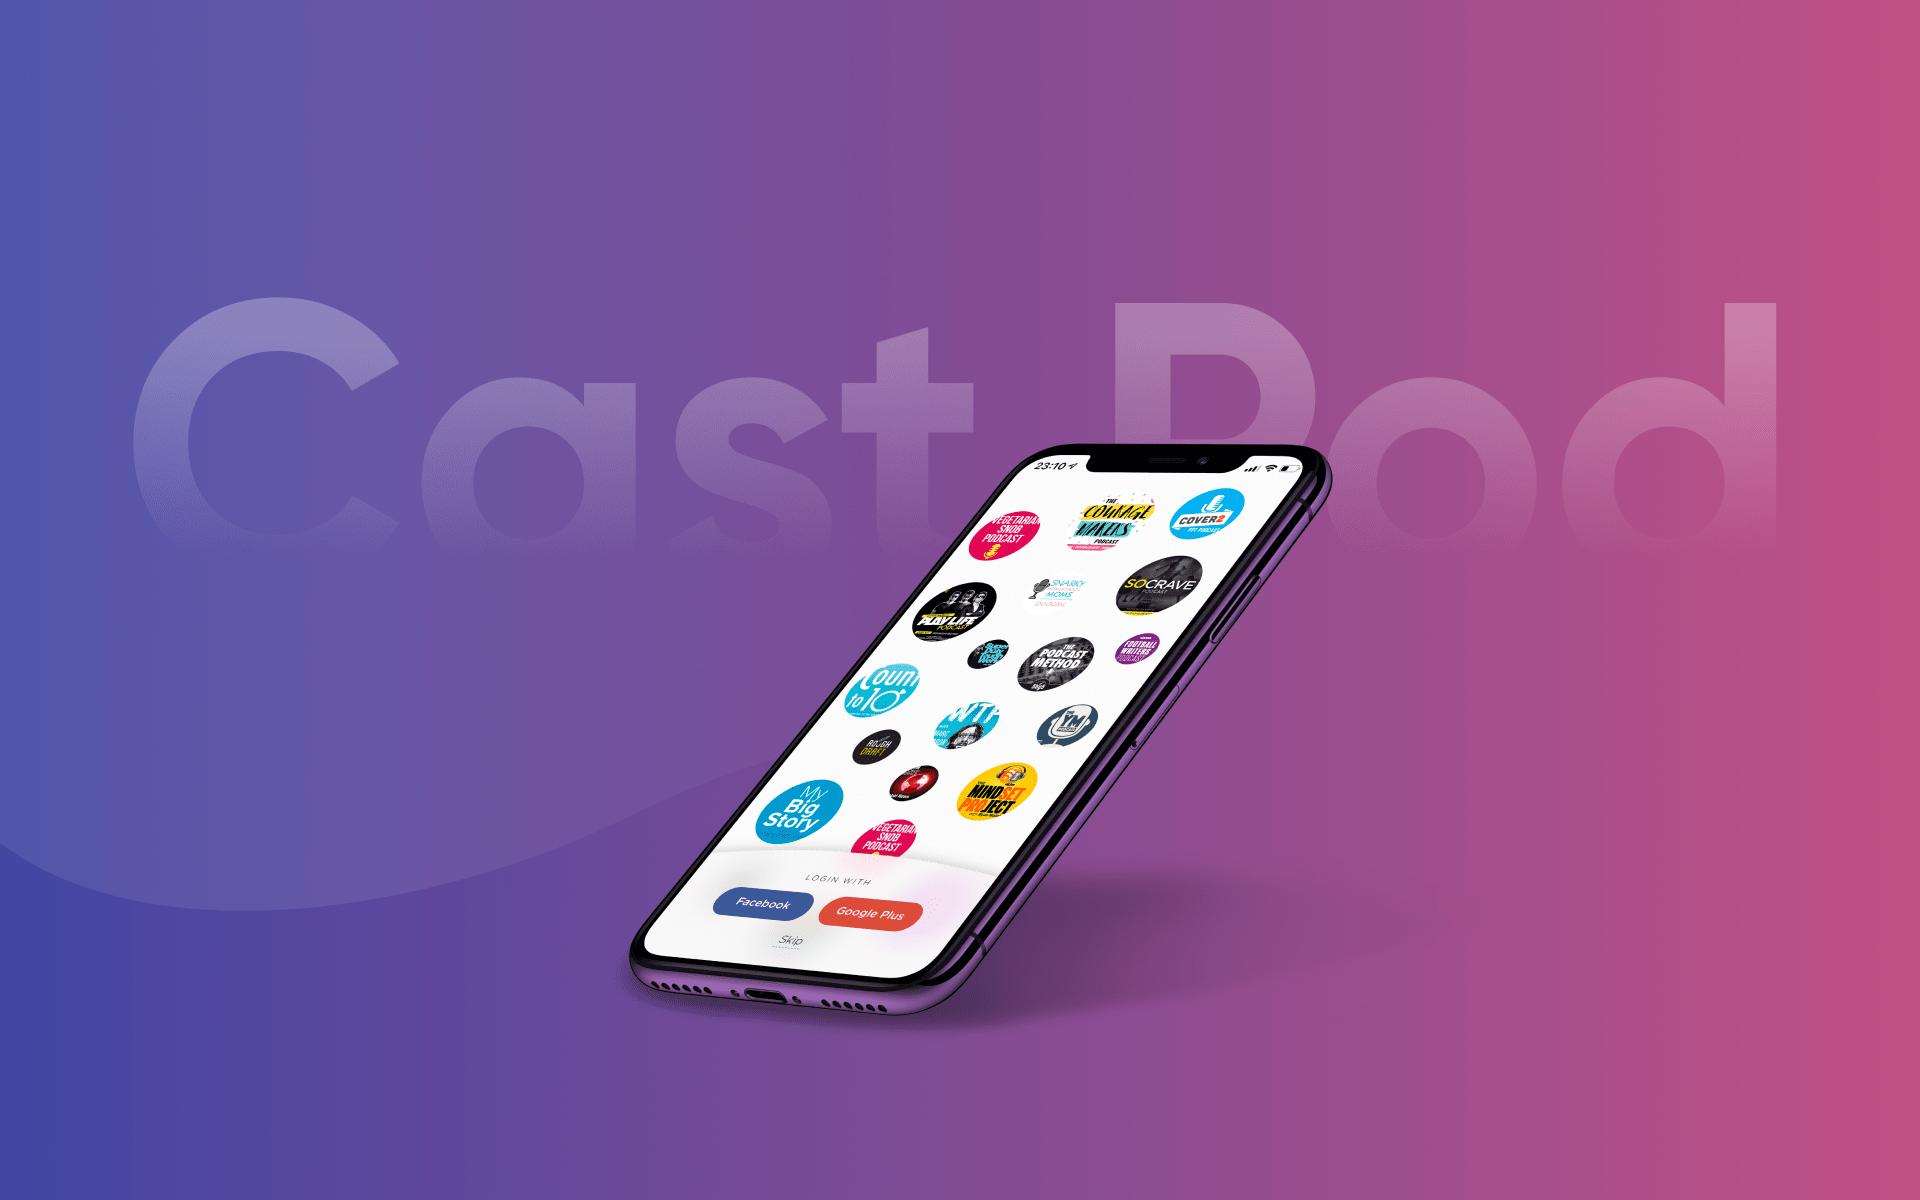 castpod_hero